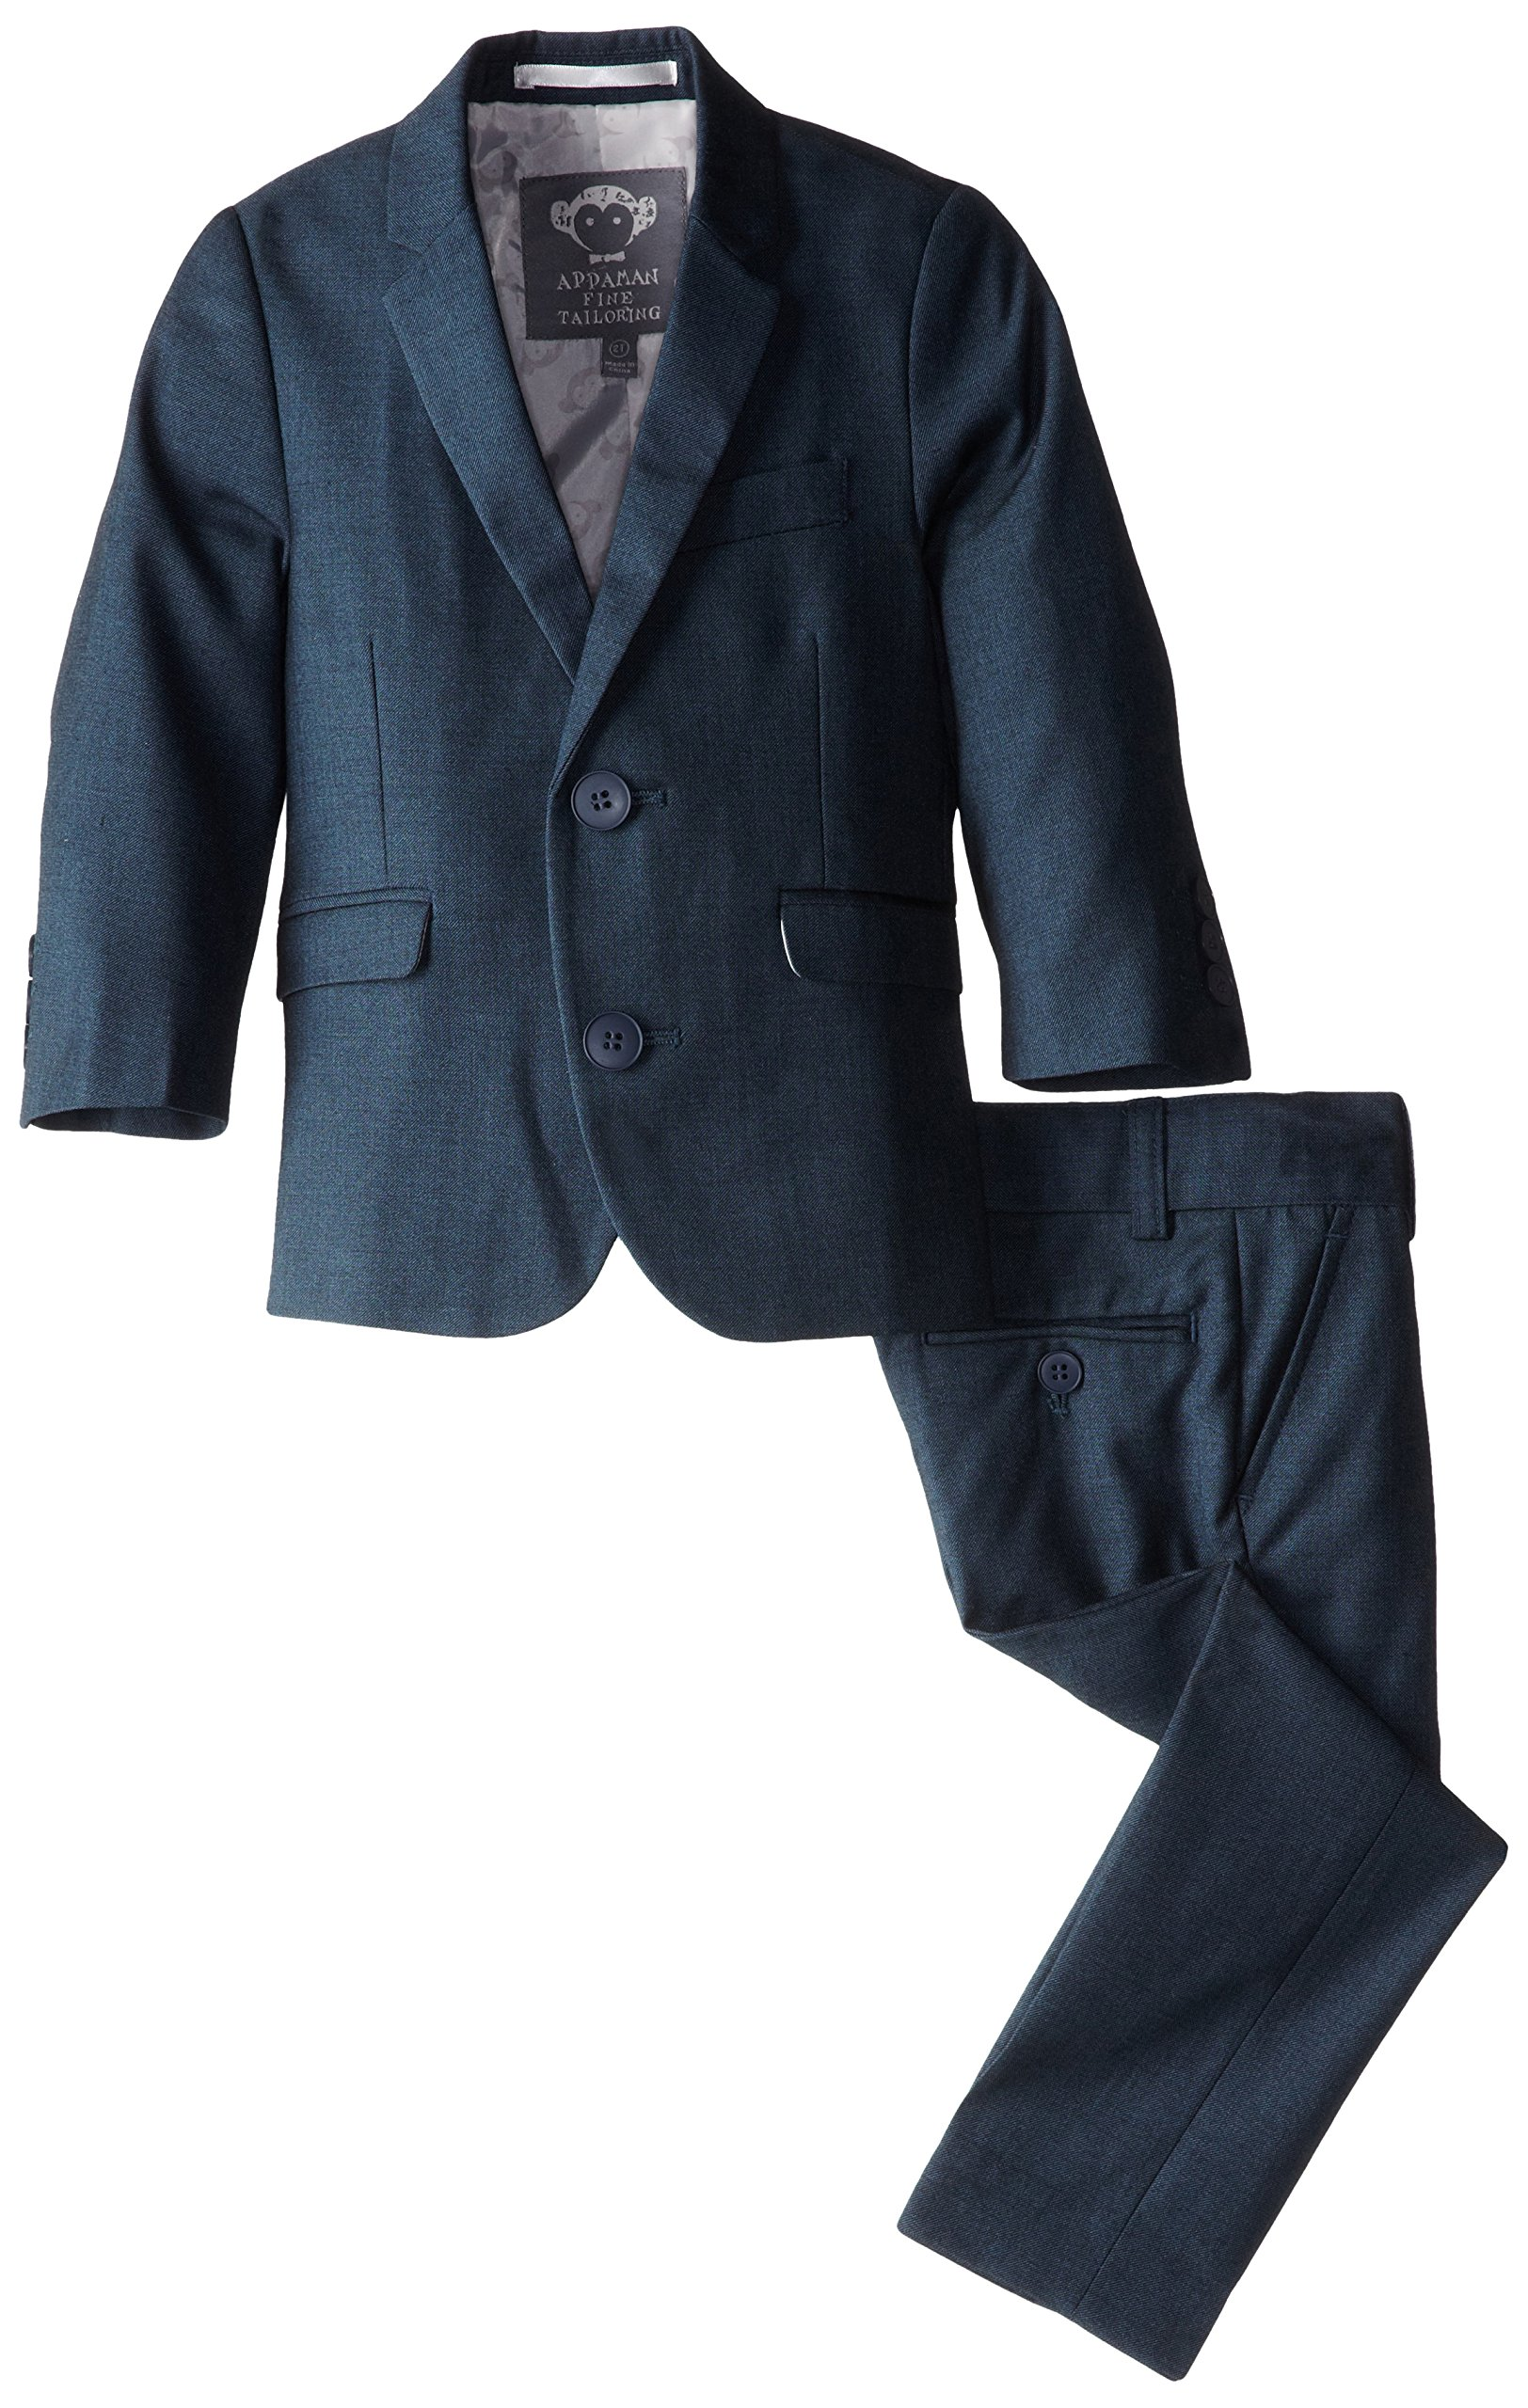 Appaman Little Boys' Two Piece Classic Mod Suit, Shark, 4